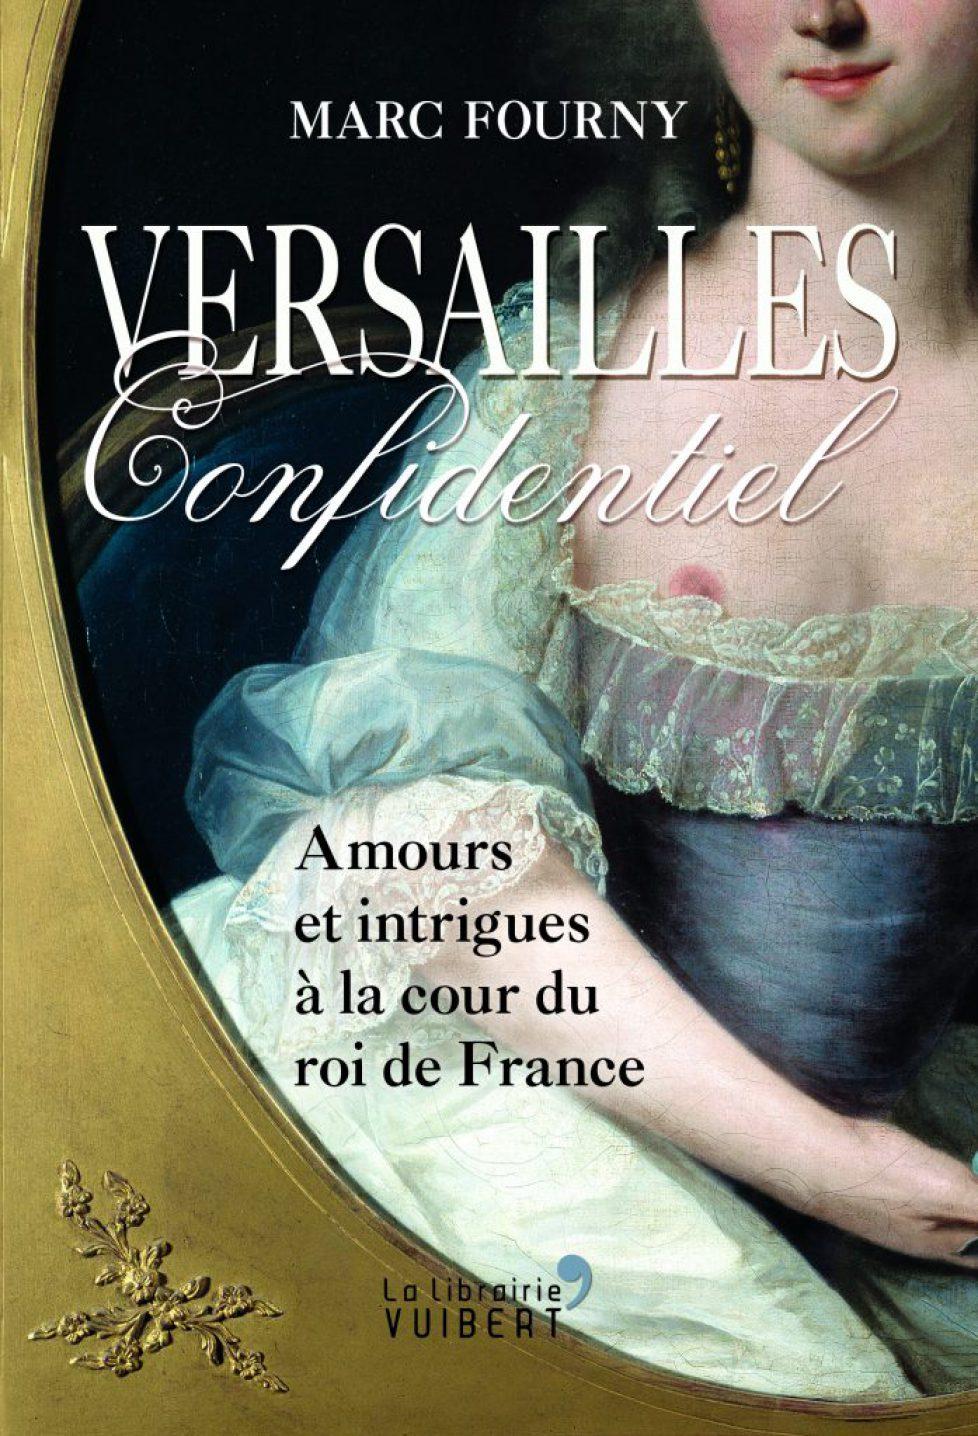 9782311102383_CV_Versailles-hd